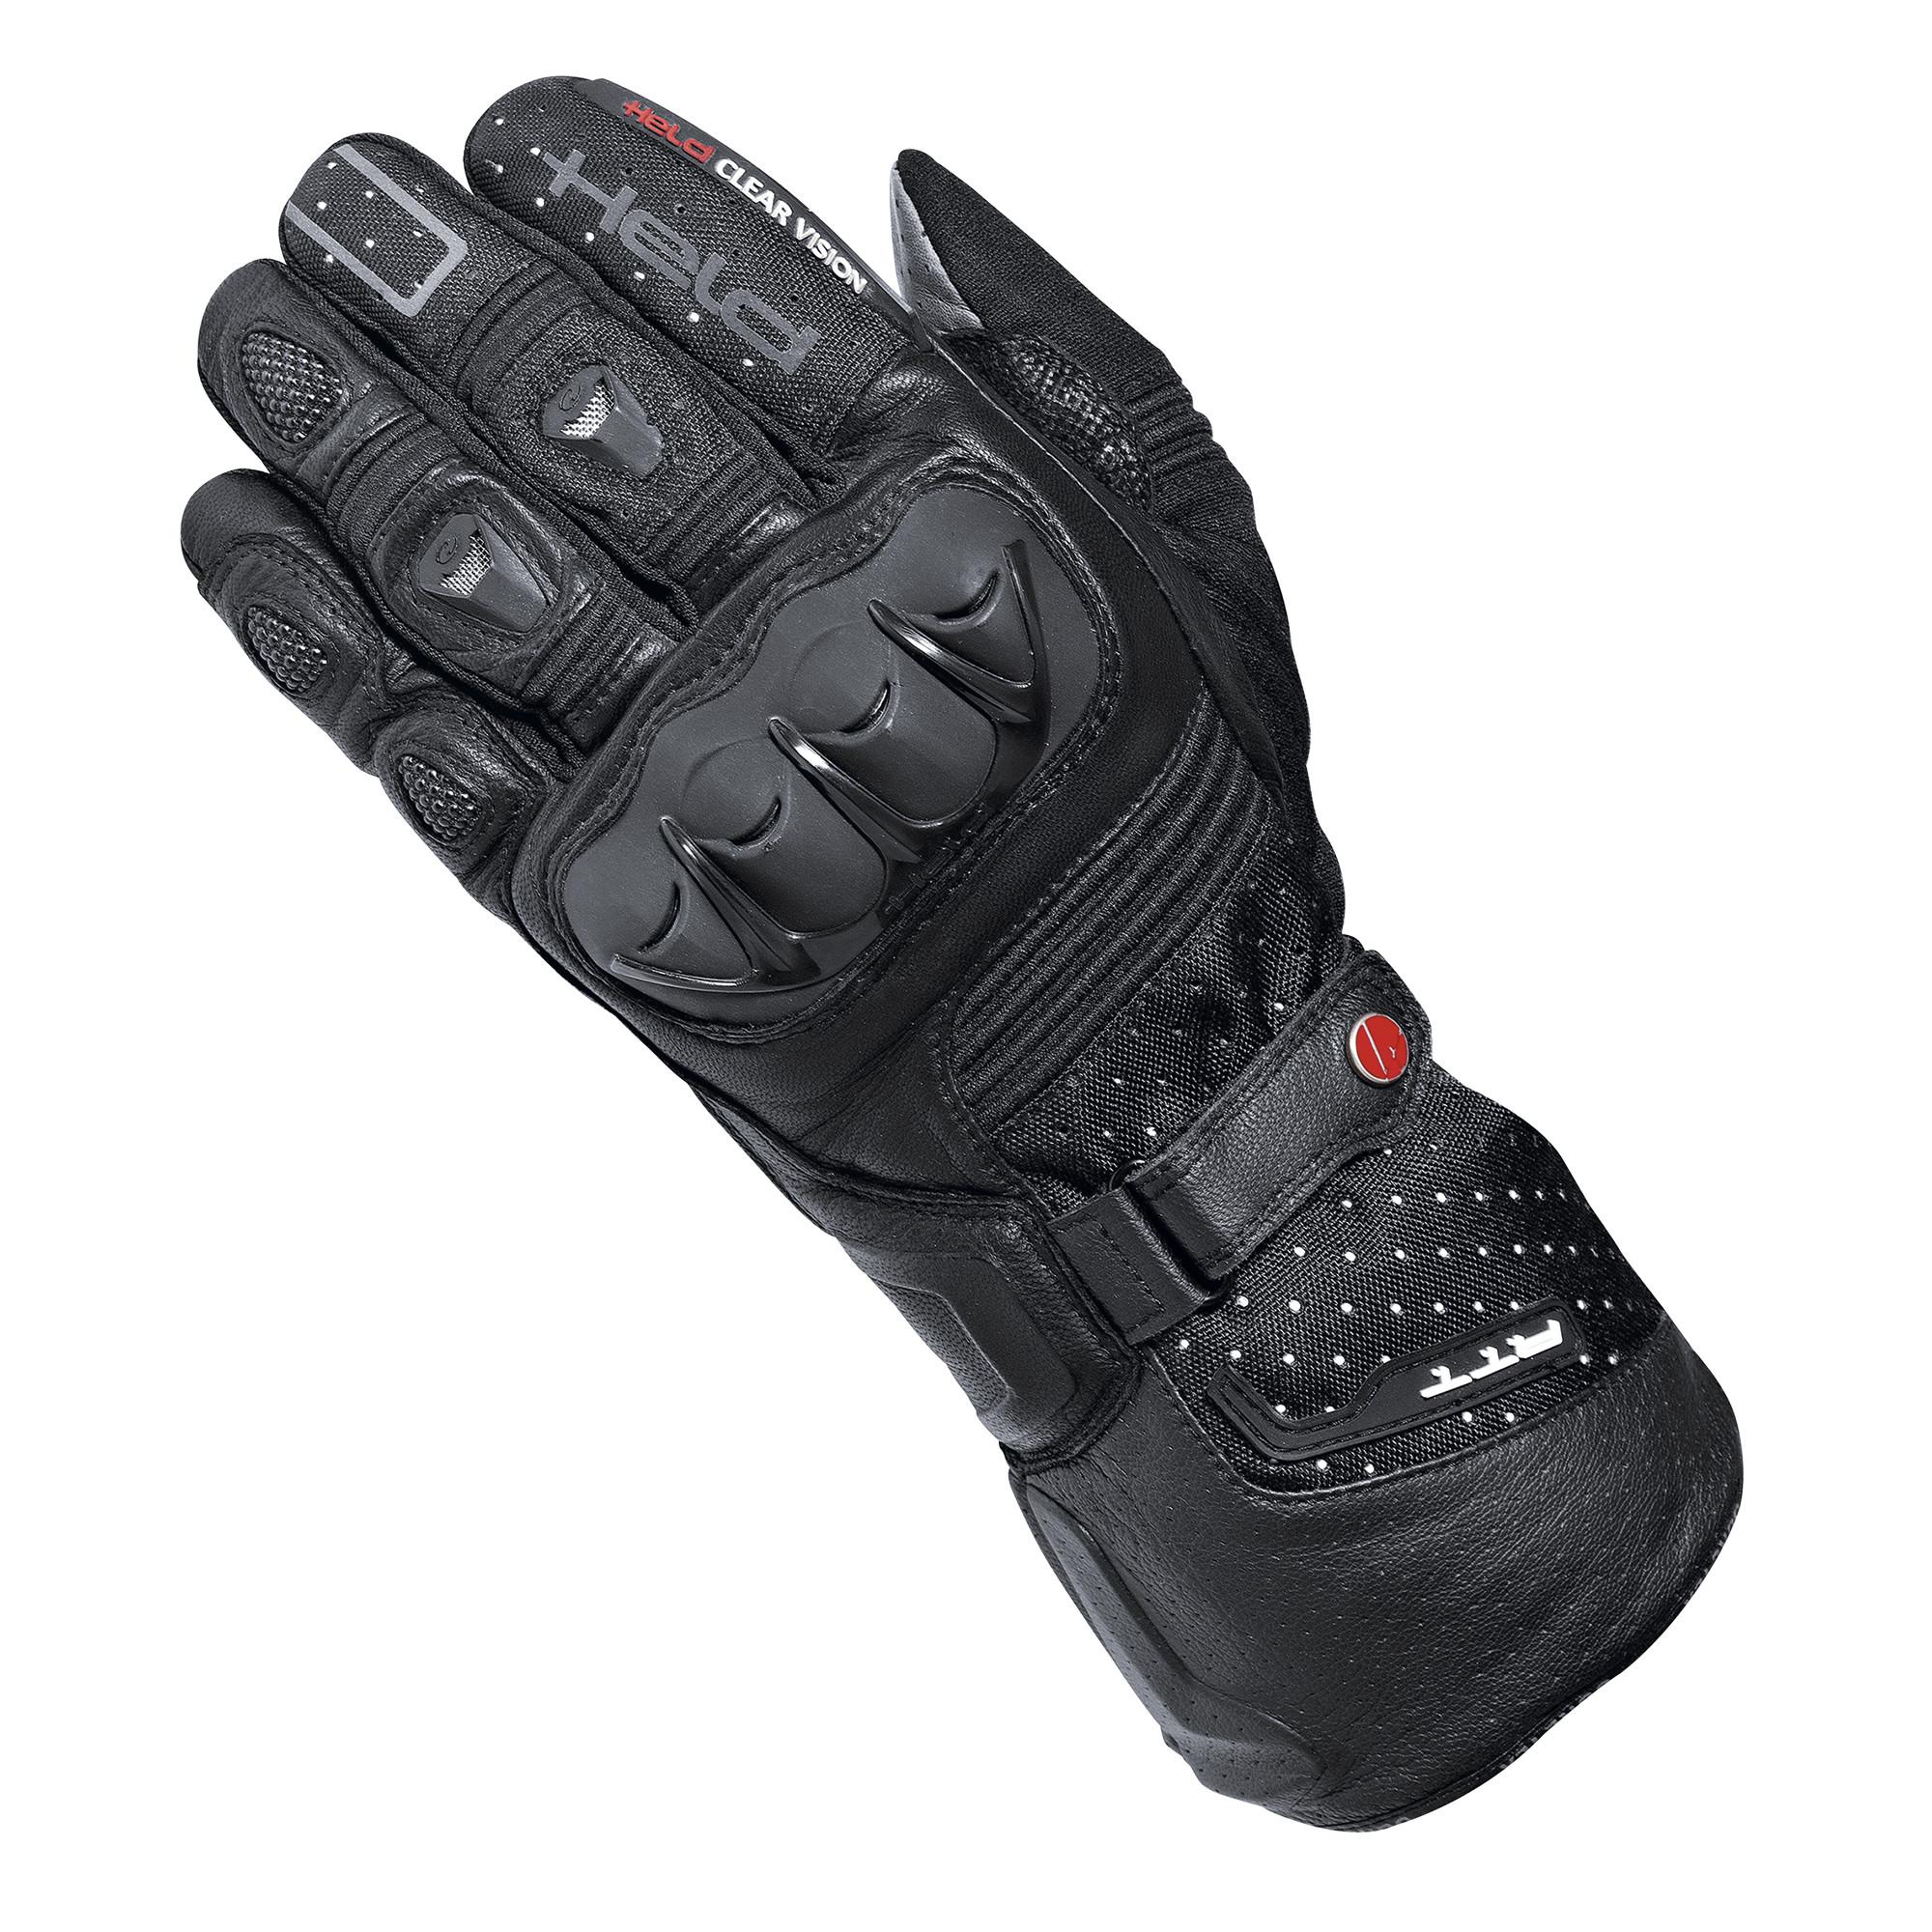 Guantes Moto Held Air N Dry Goretex Touring Negro Um